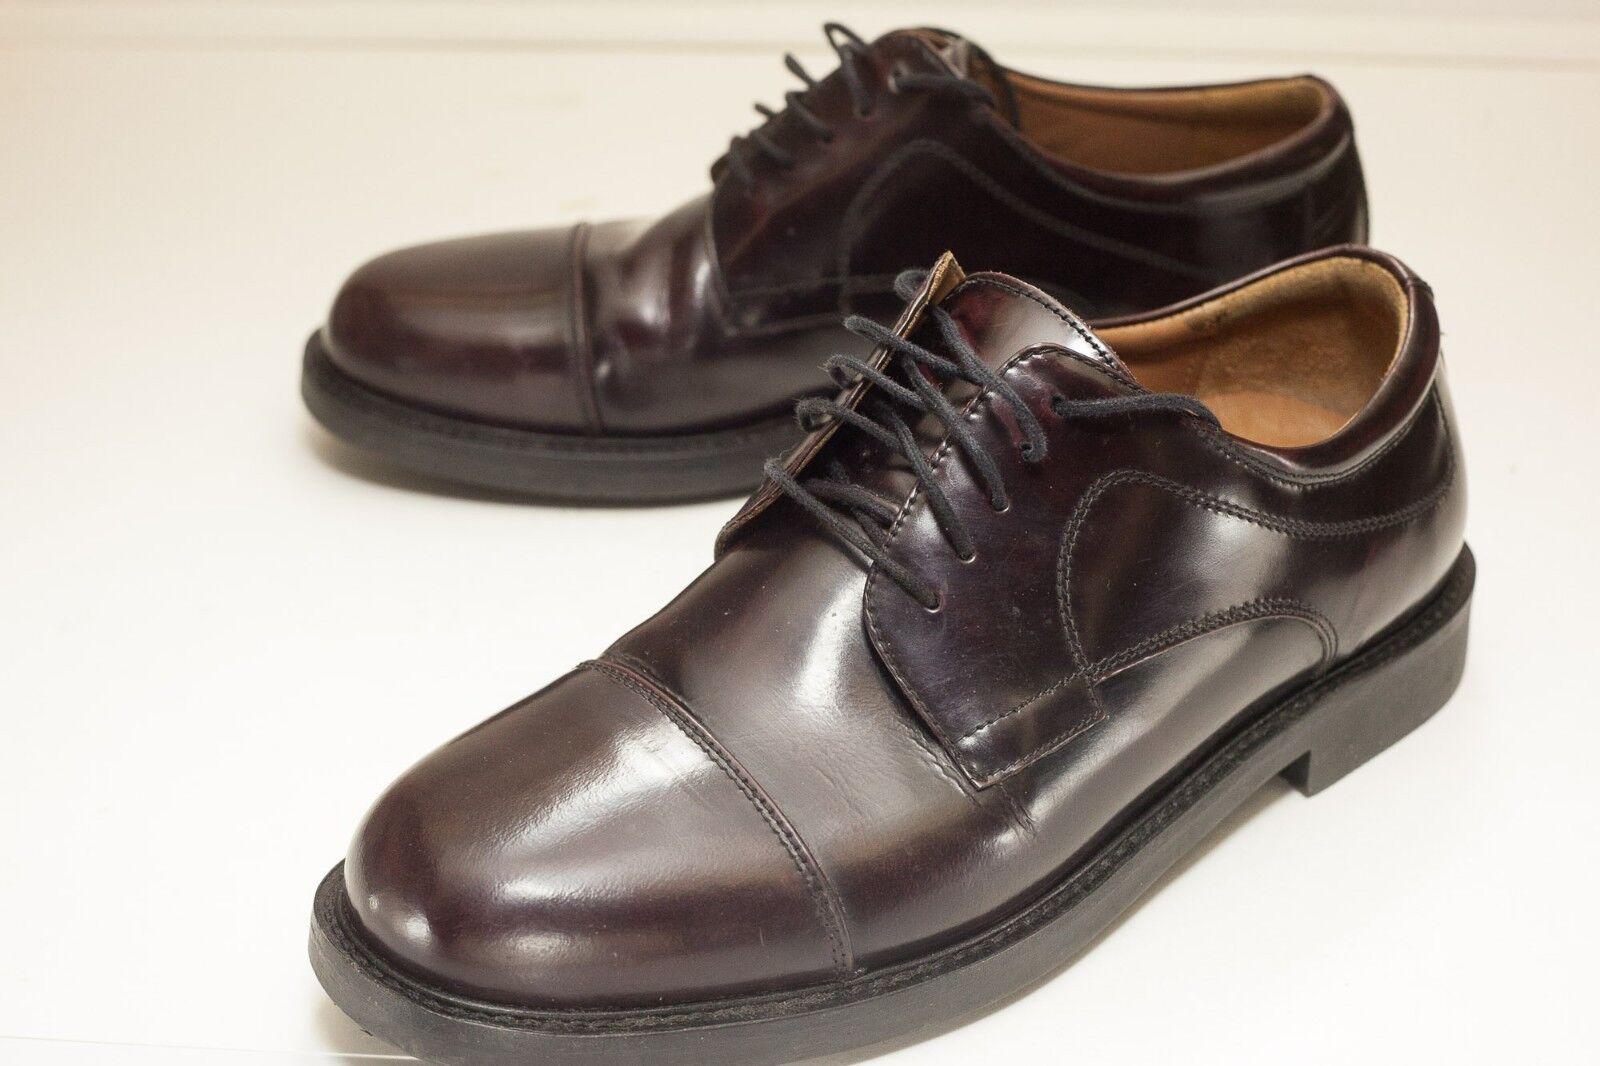 Johnston & Murphy Size 9 Brown Cap Toe Dress shoes Men's